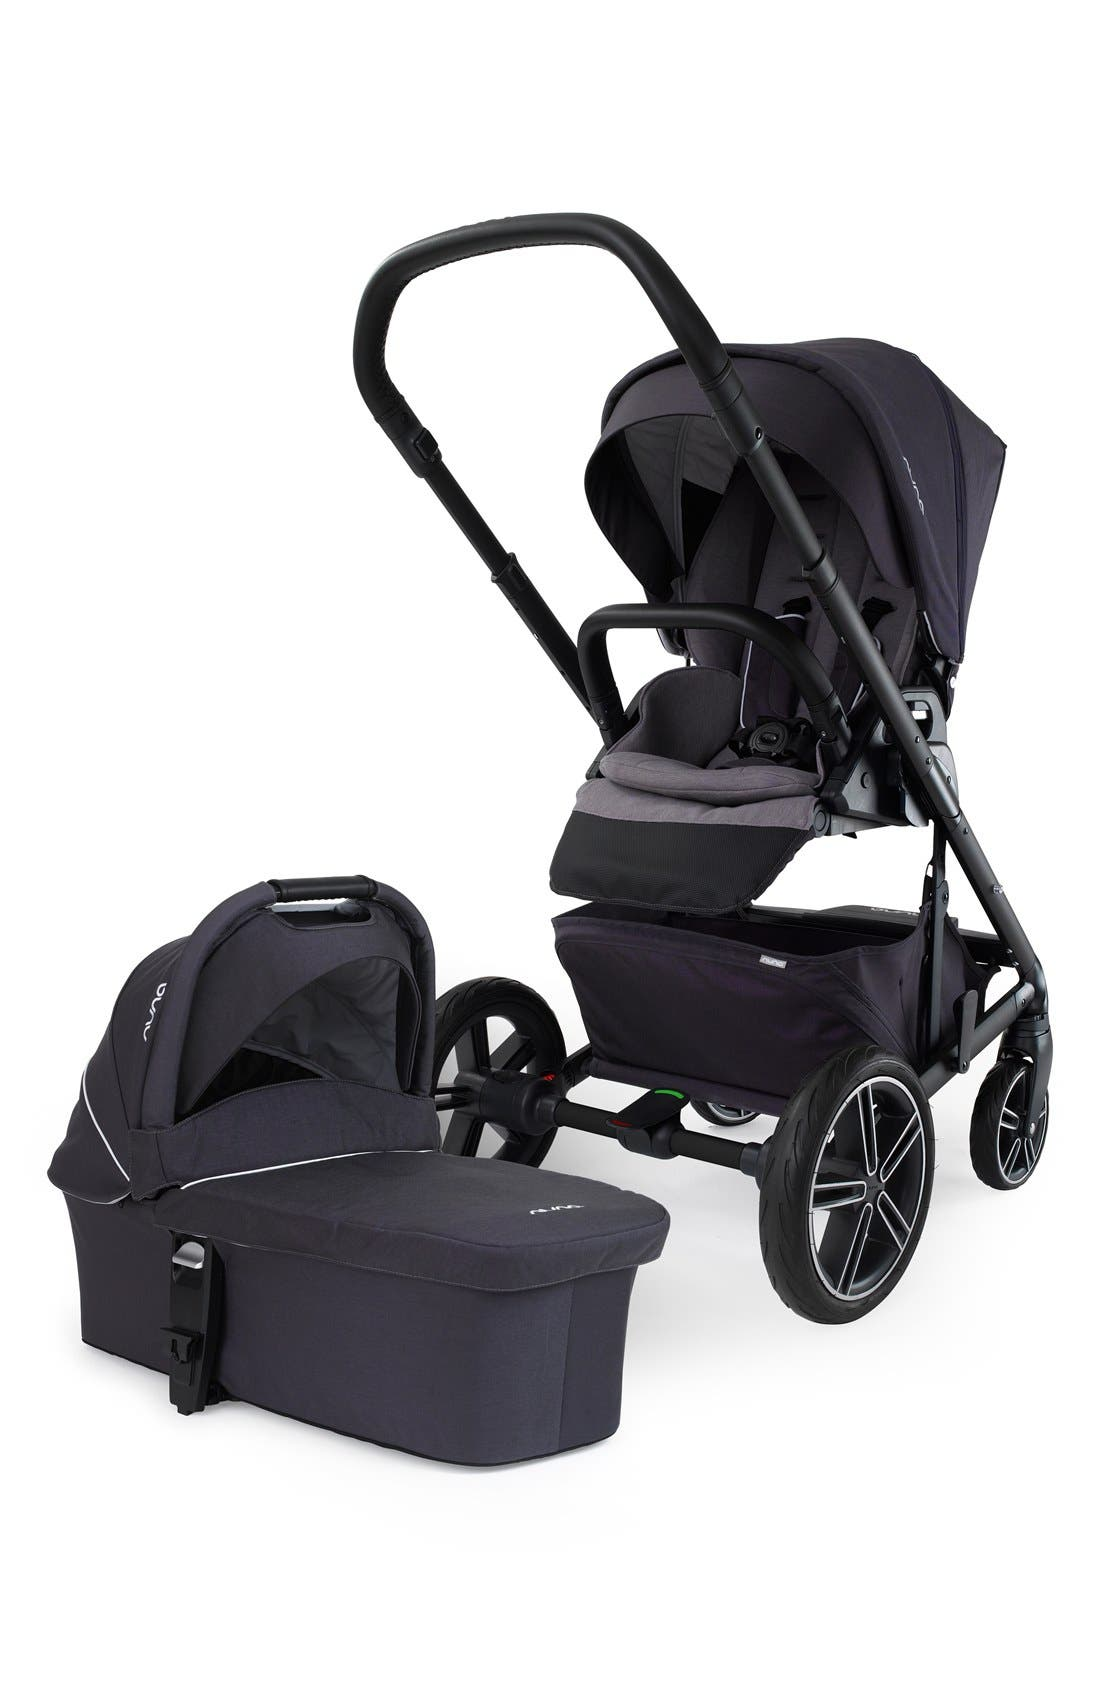 NUNA 'MIXX™' Stroller System